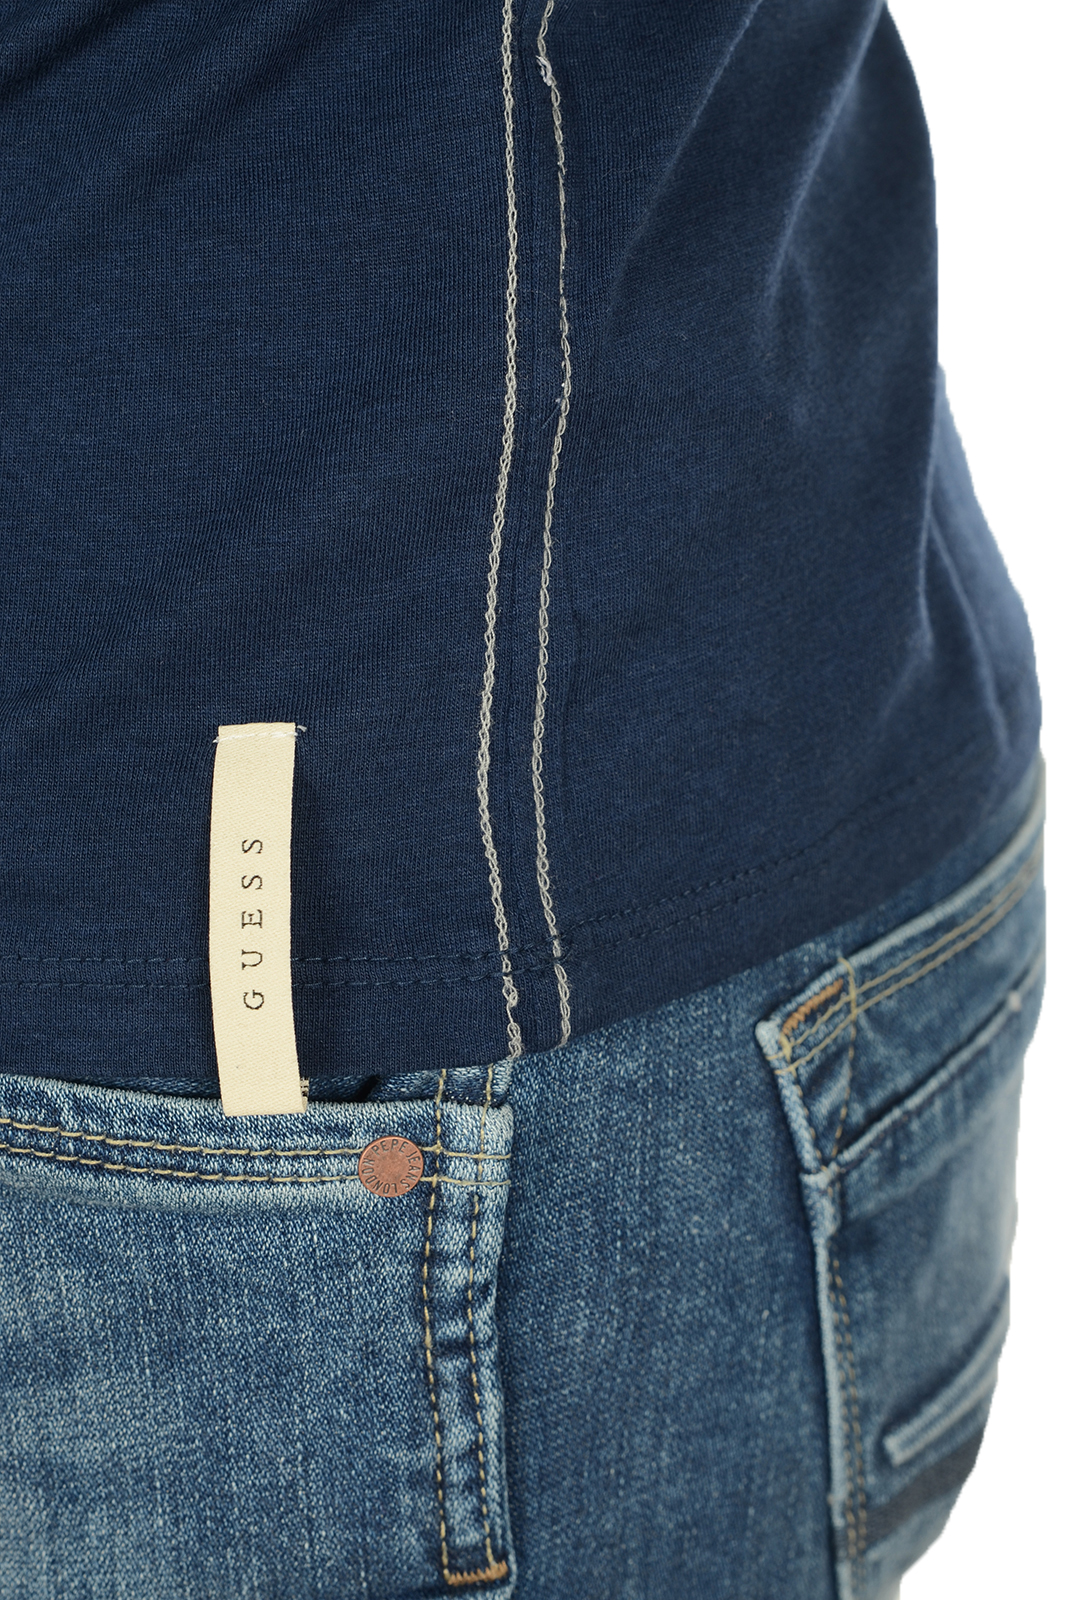 Tee-shirts  Guess jeans M72I53K5J70 A716 BLEU